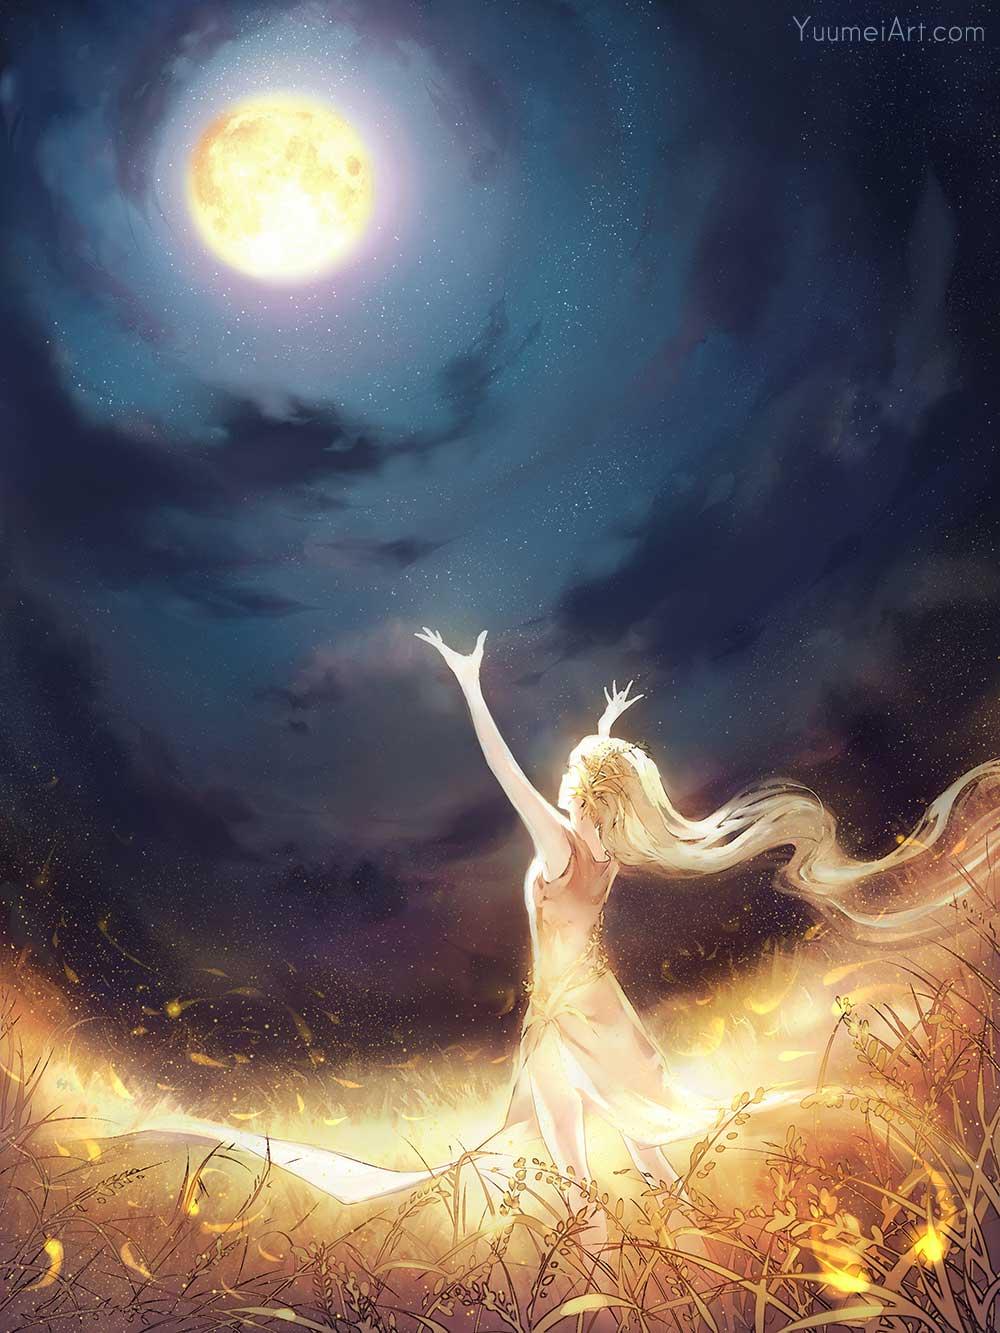 Moon Catcher by Artist Wenqing Yan, aka Yuumei